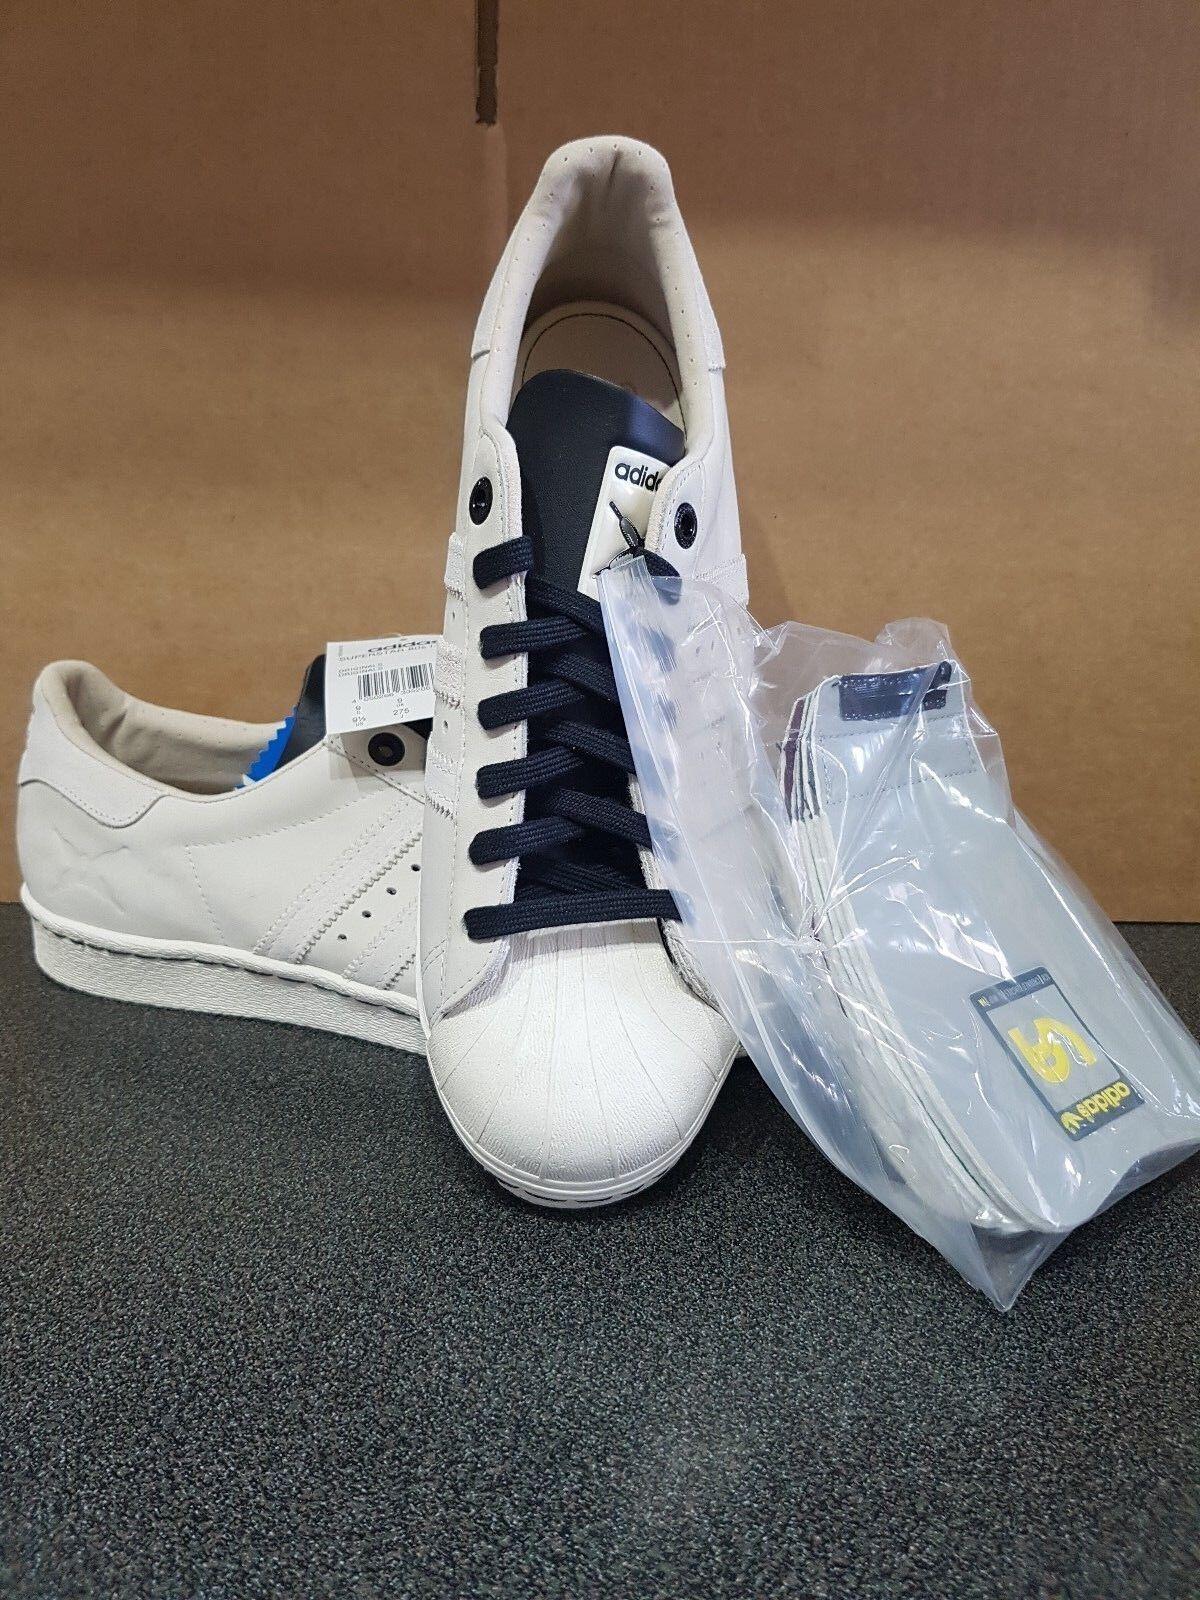 Adidas Superstar années 80 Consortium 3 Way COLLAB VA VA VA ACU CROOKED TONGUES D-Mop UK9 1c500b